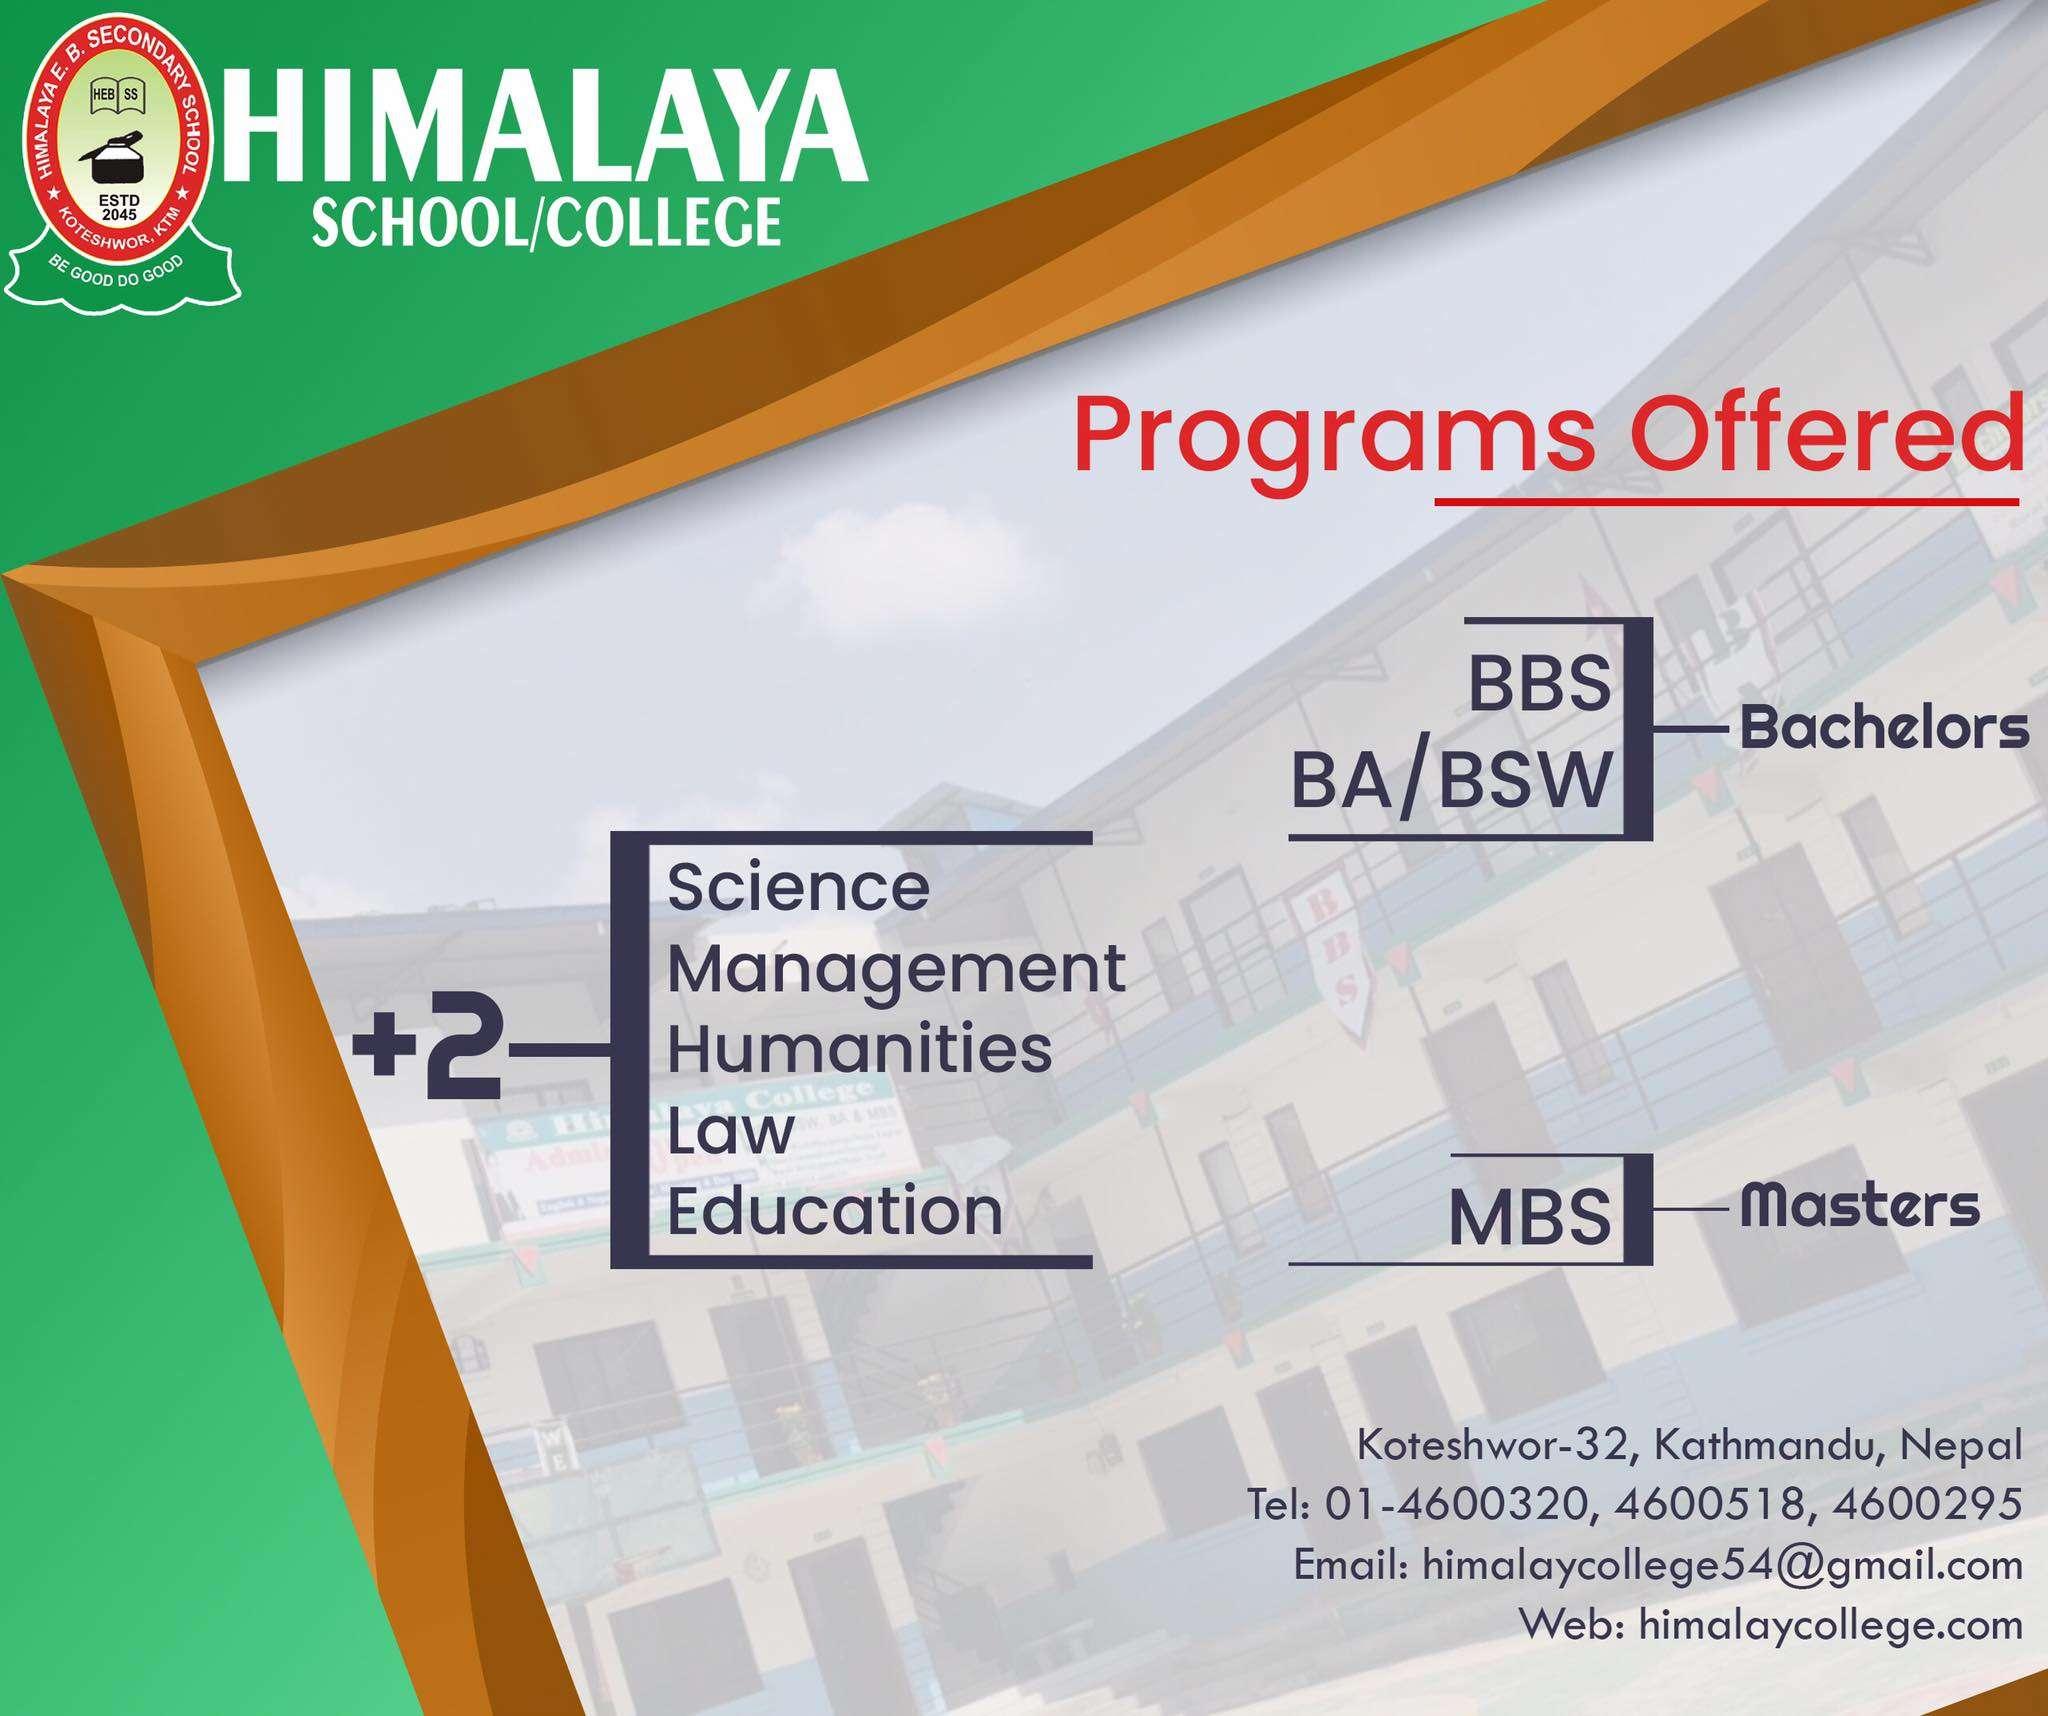 Himalaya School / College